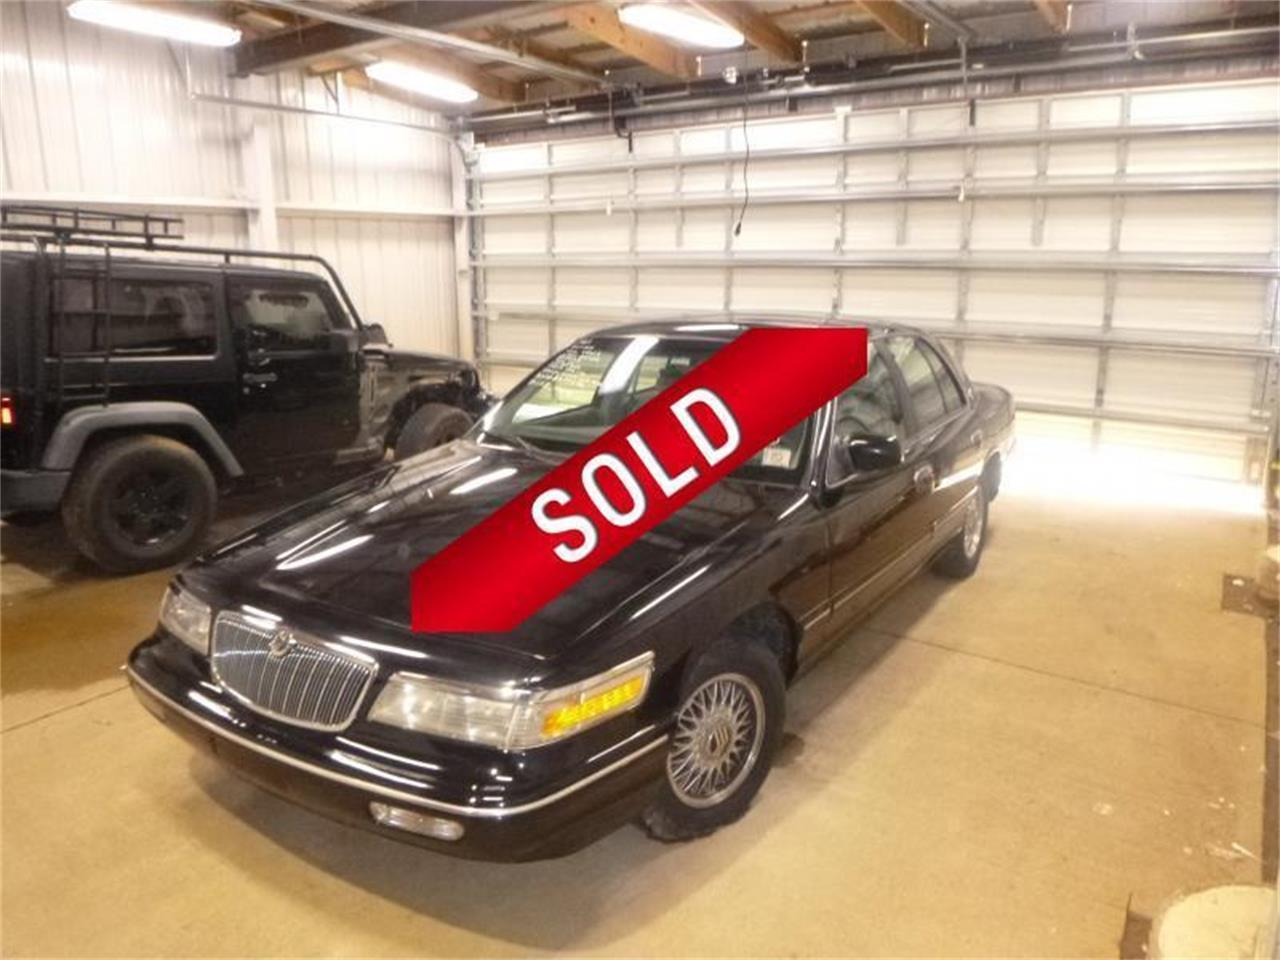 1995 Mercury Grand Marquis >> 1995 Mercury Grand Marquis For Sale Classiccars Com Cc 1106616